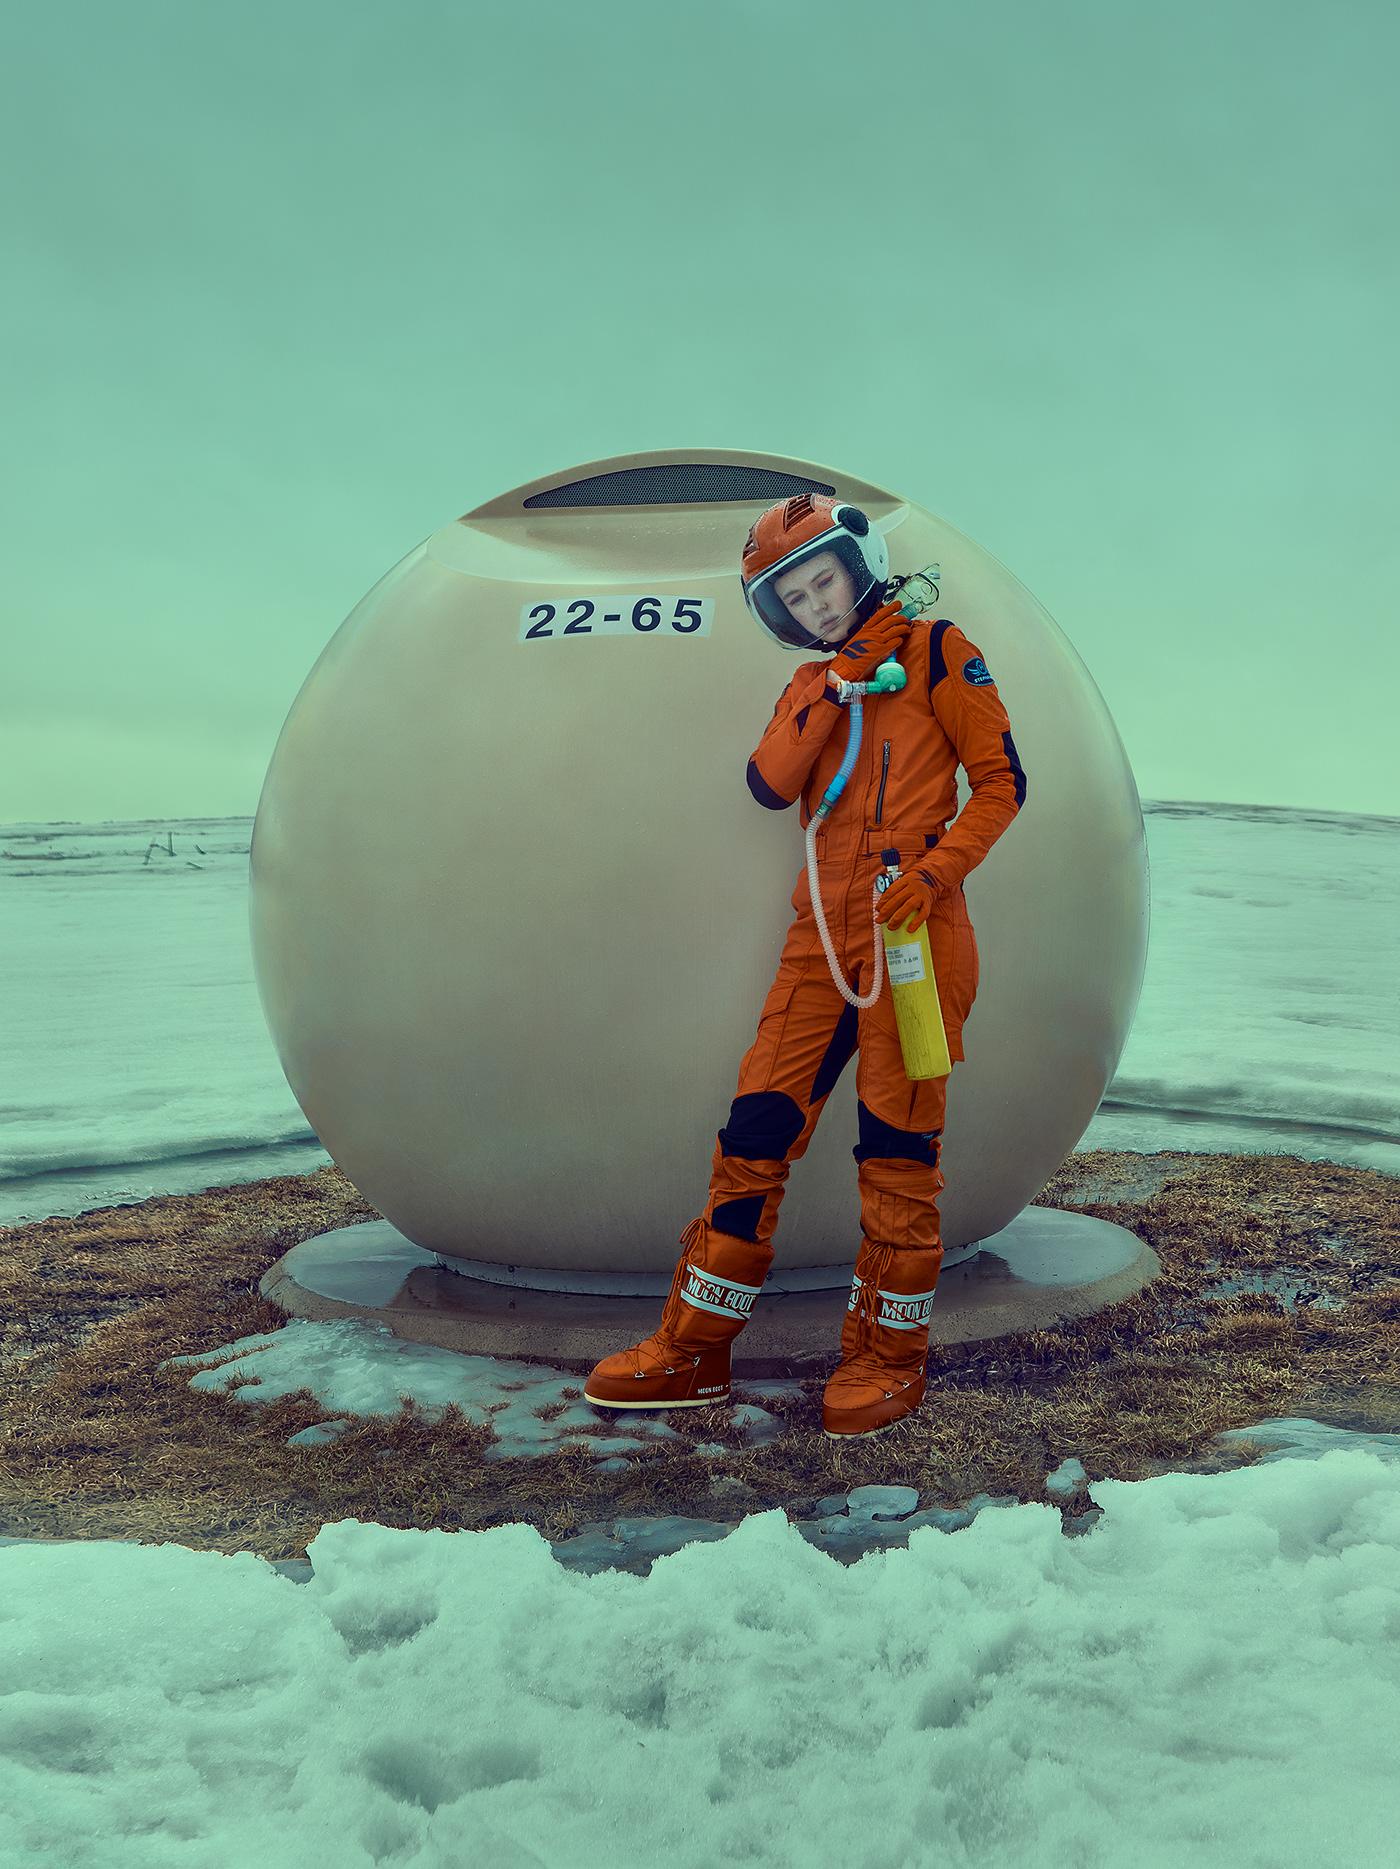 art desert design digital Fashion  Landscape modern music snow stylist